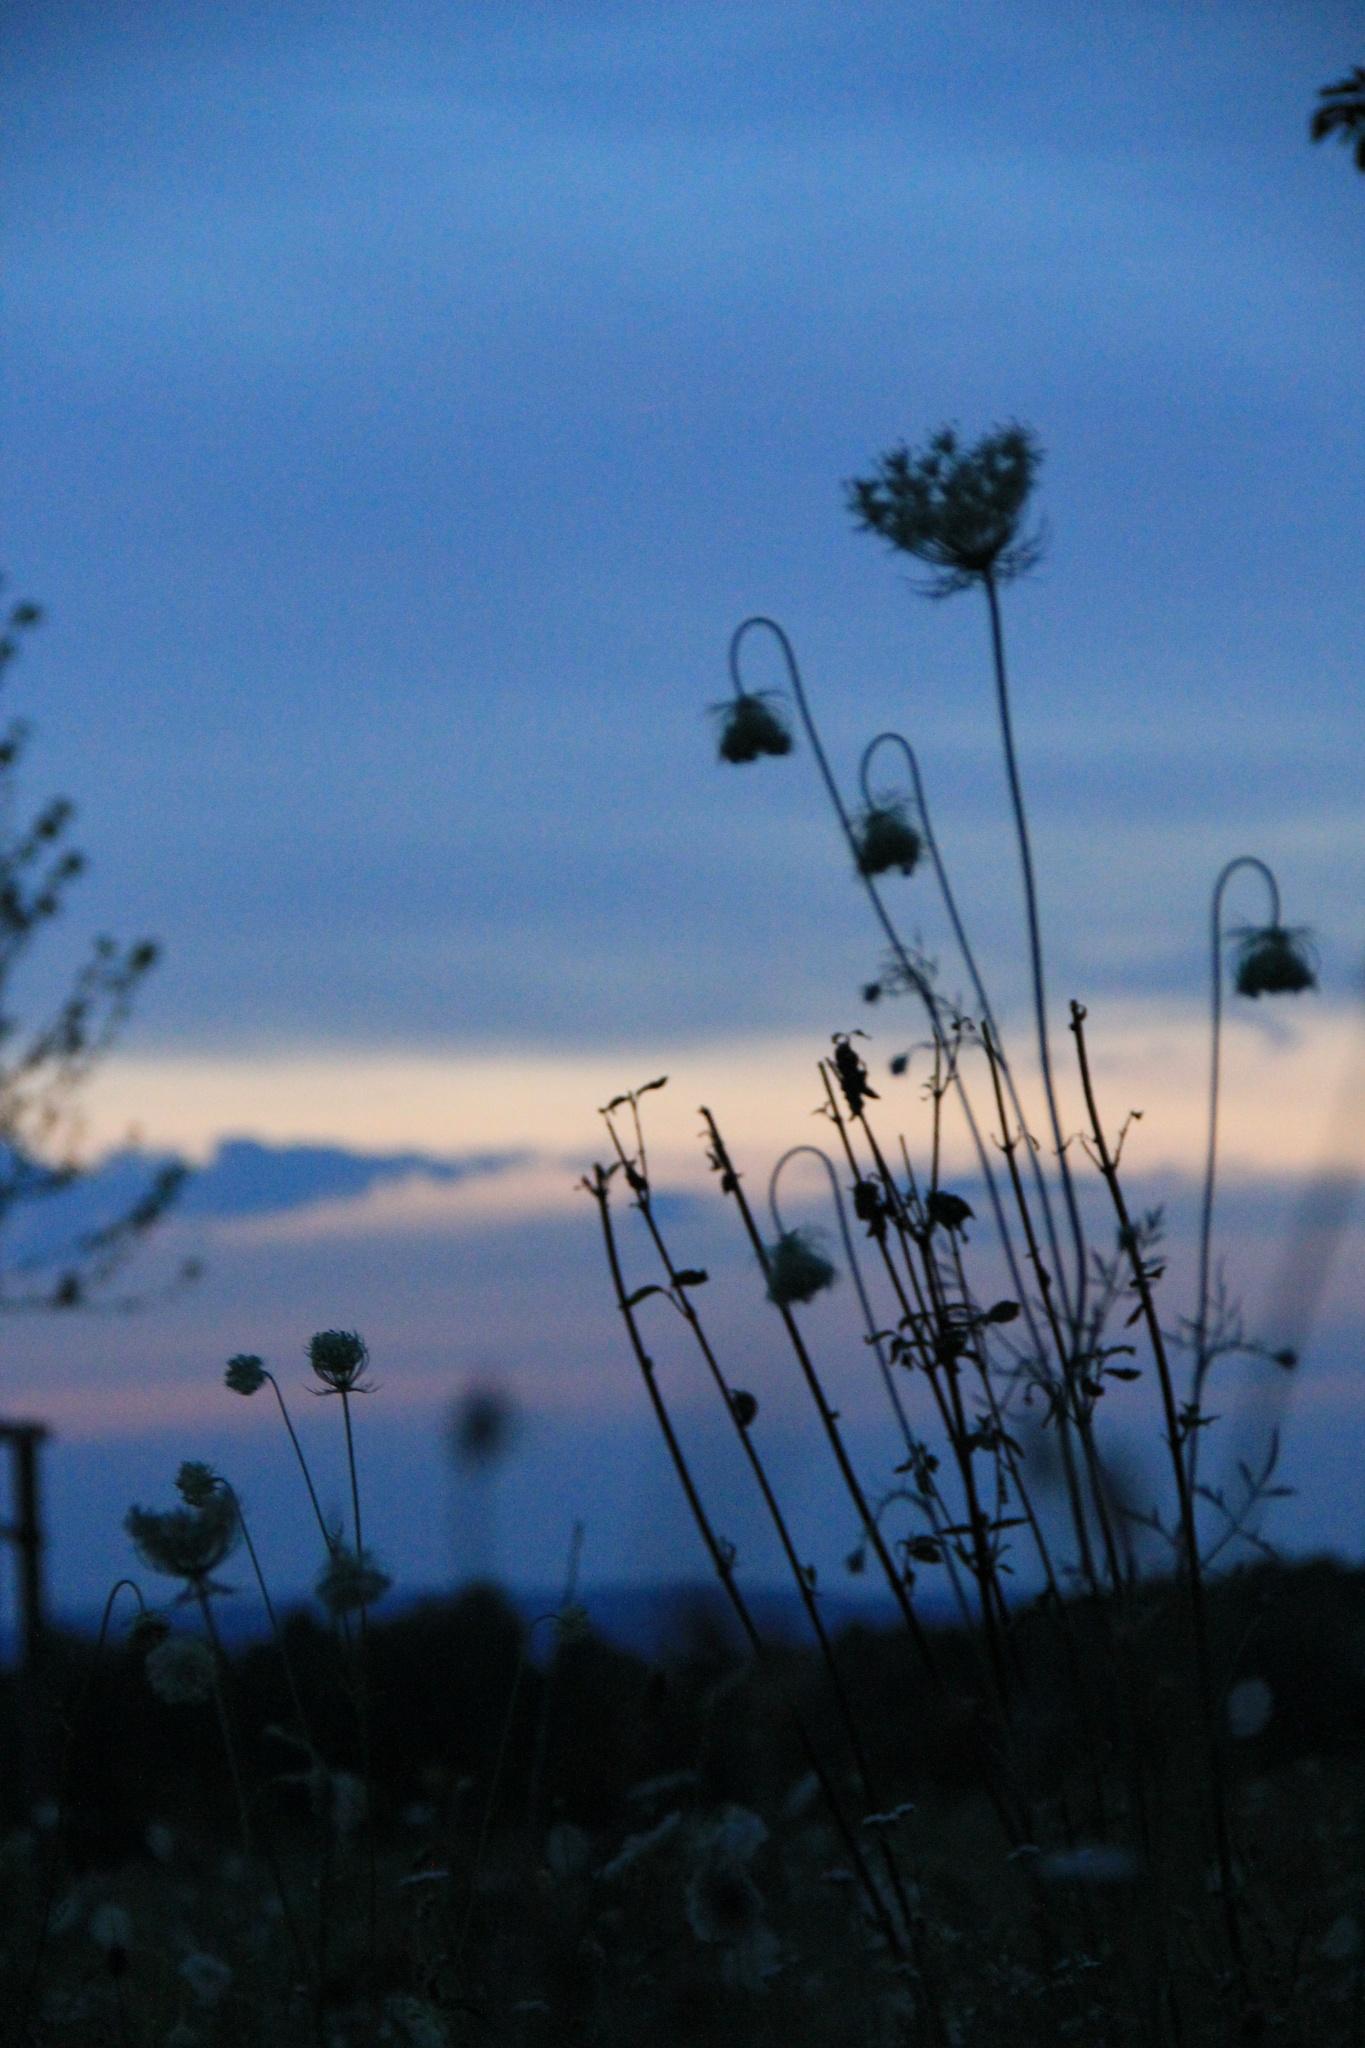 flowers at night by hamaro